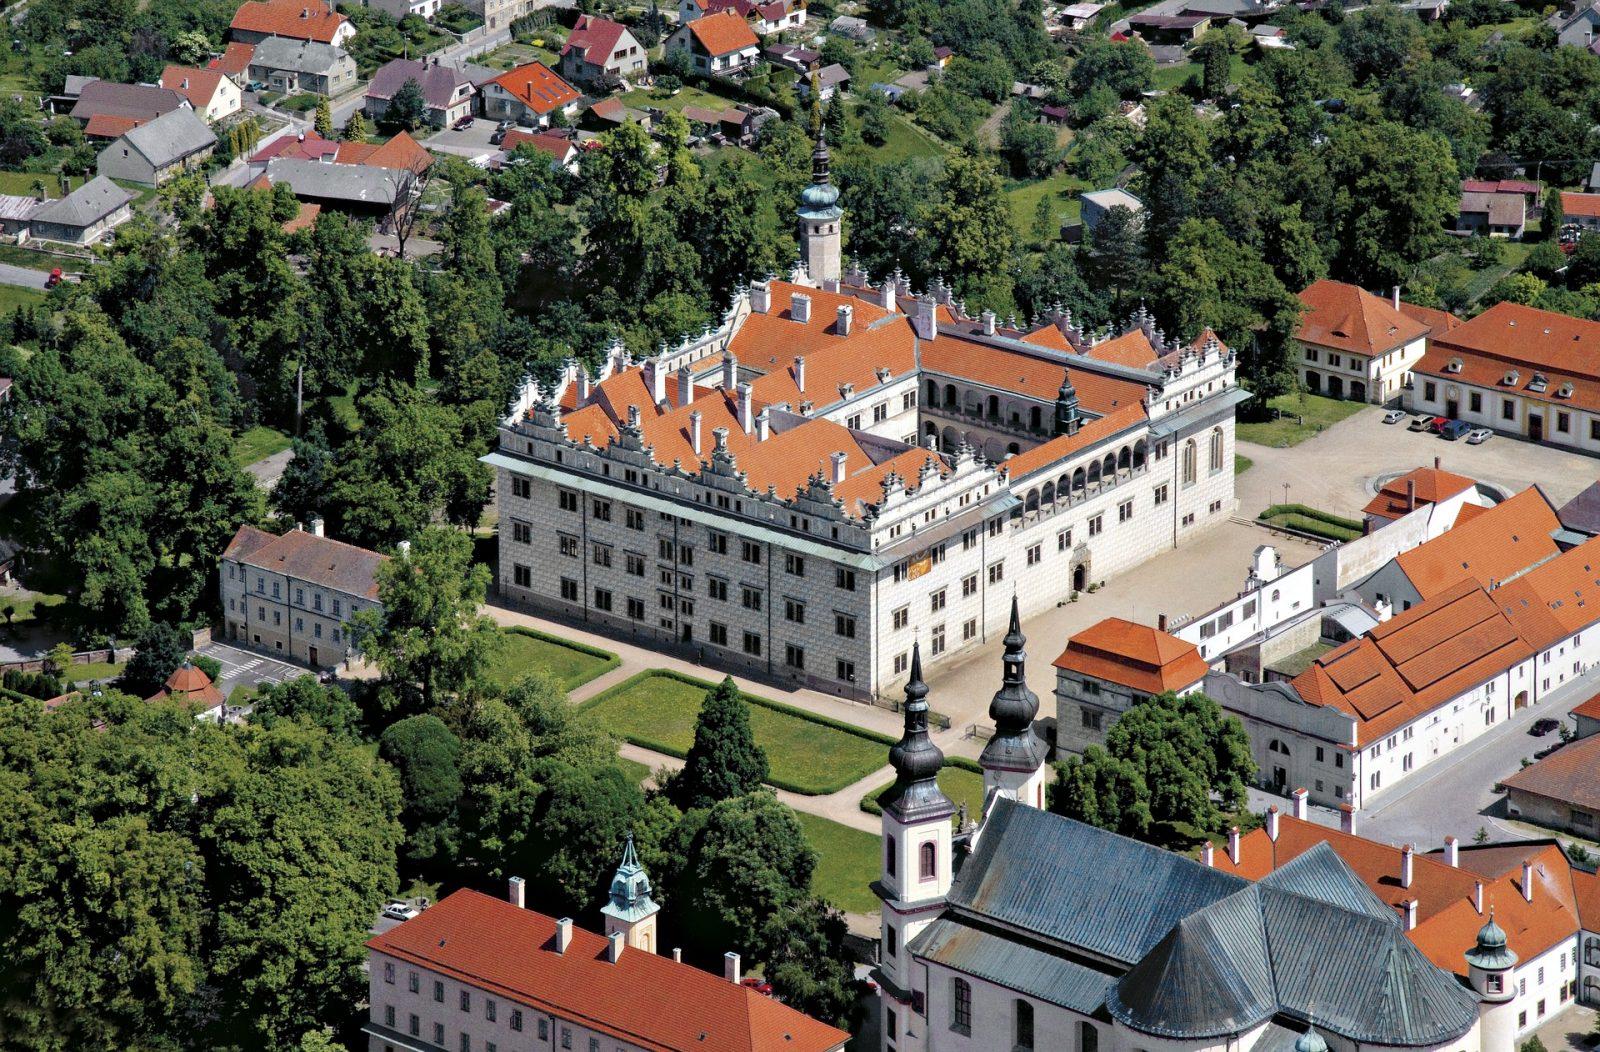 UNESCO Litomysl Chateau in the Czech Republic